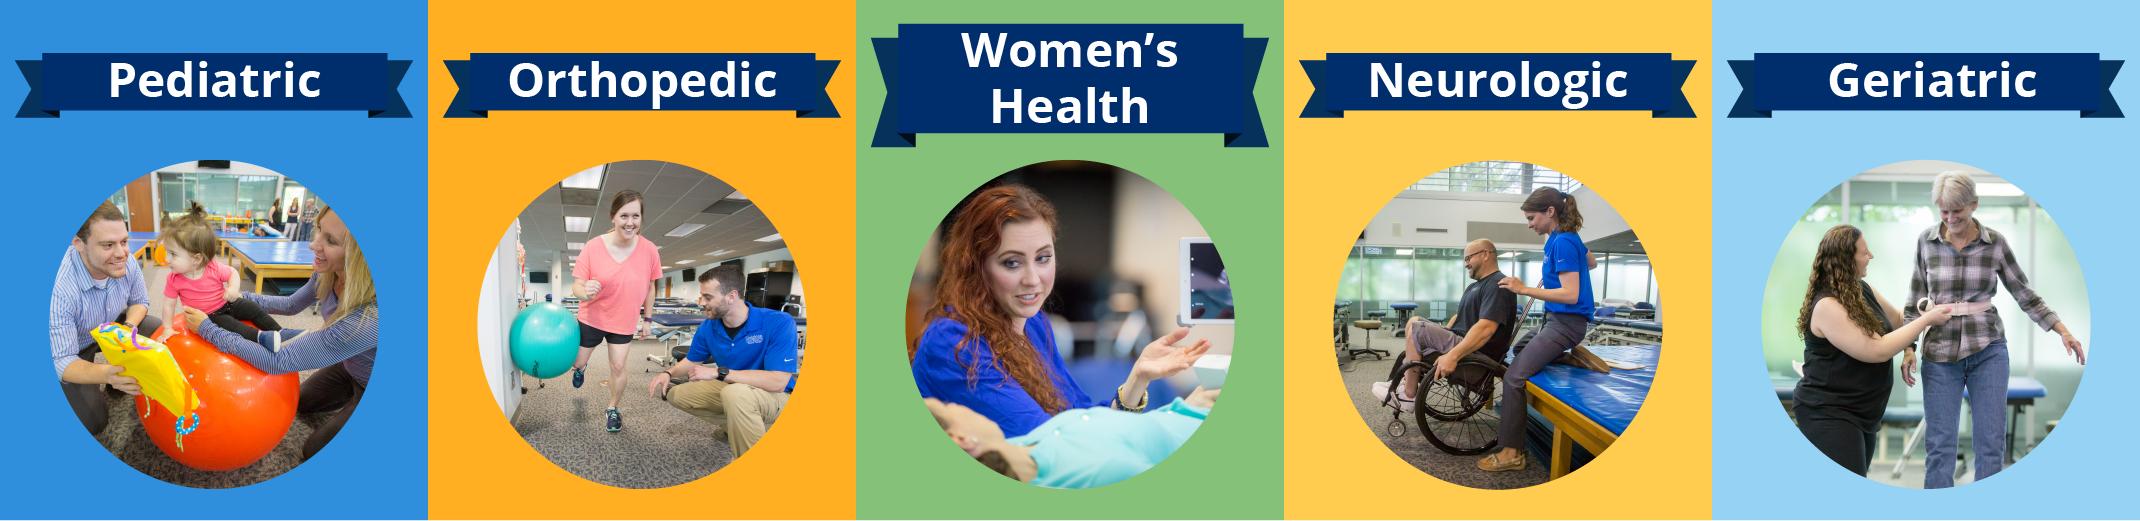 geriatric, pediatric, orthopedic, neurologic, women's health